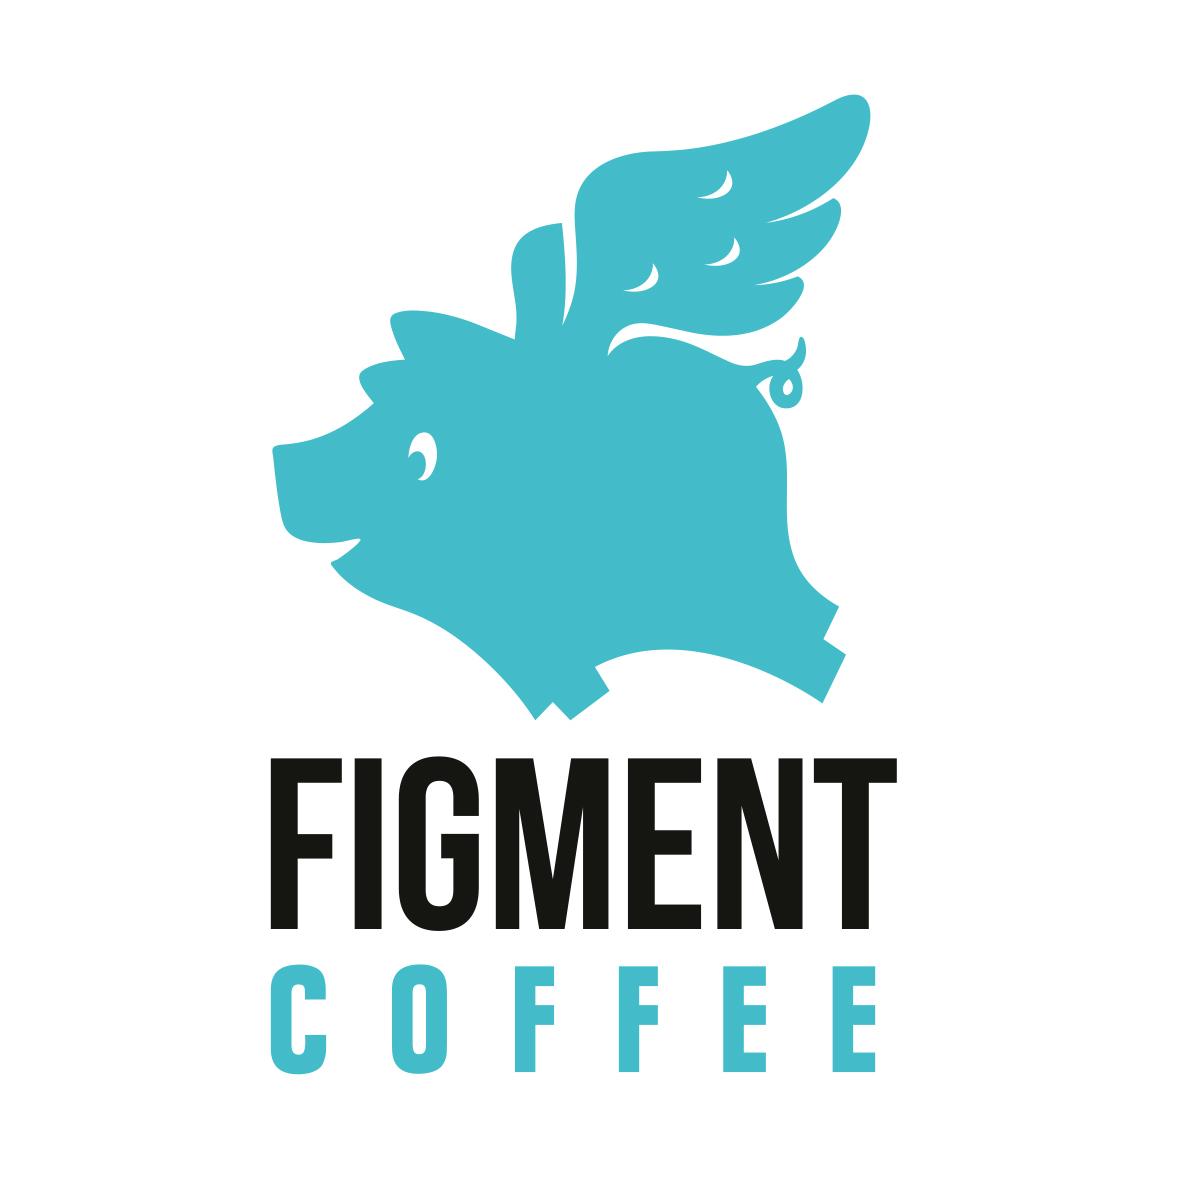 FIGMENT COFFEE COMPANY LIMITED